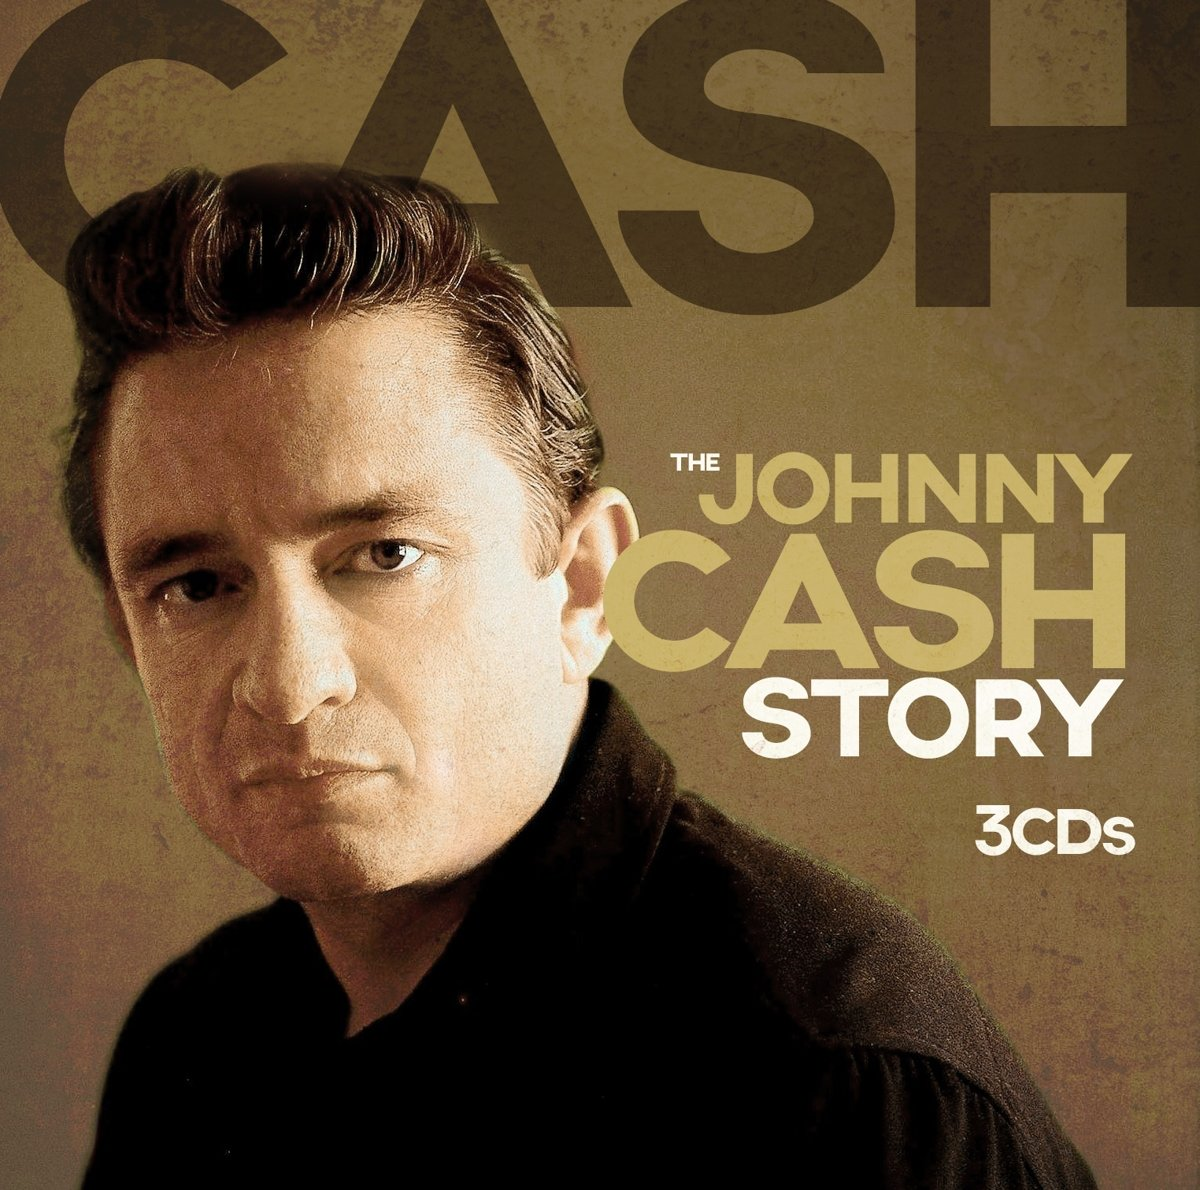 Джонни Кэш Johnny Cash. The Johnny Cash Story (3 CD) джонни хортон johnny horton the ballads of johnny horton